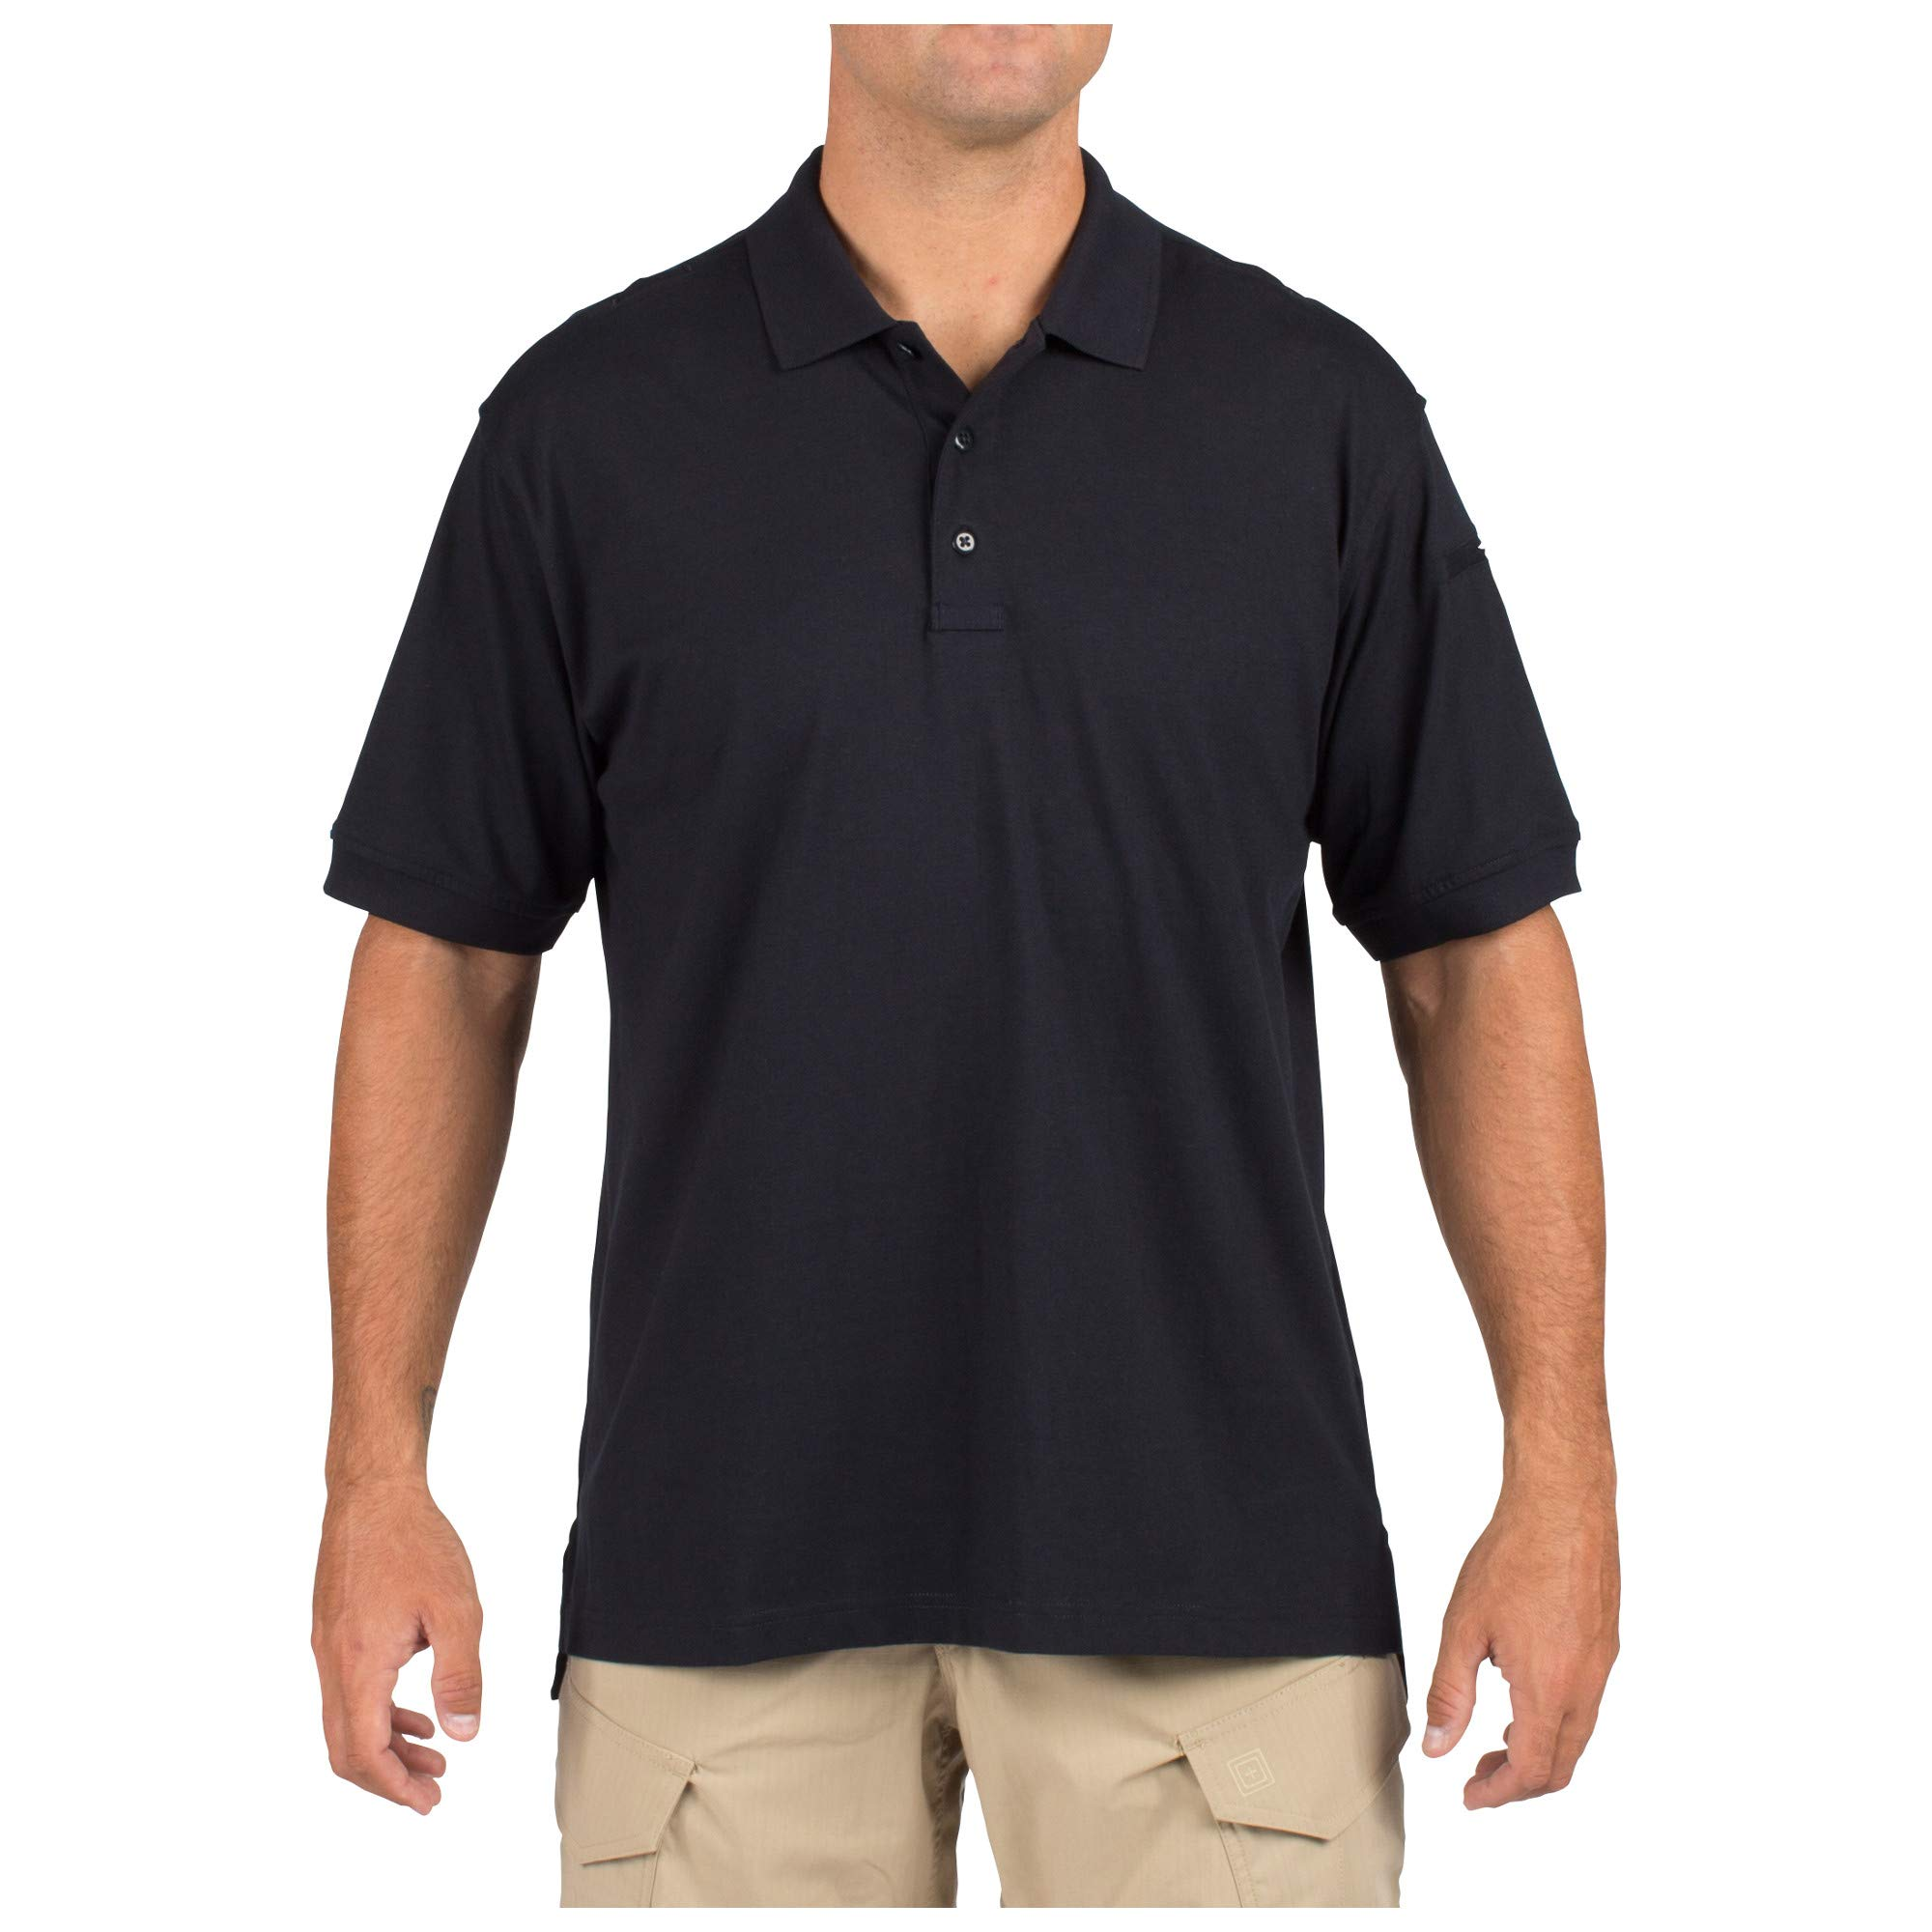 5.11 Tactical Men's Jersey Knit Short Sleeve Shirt Wrinkle-Resistant Cotton Pen Pocket Style 71182